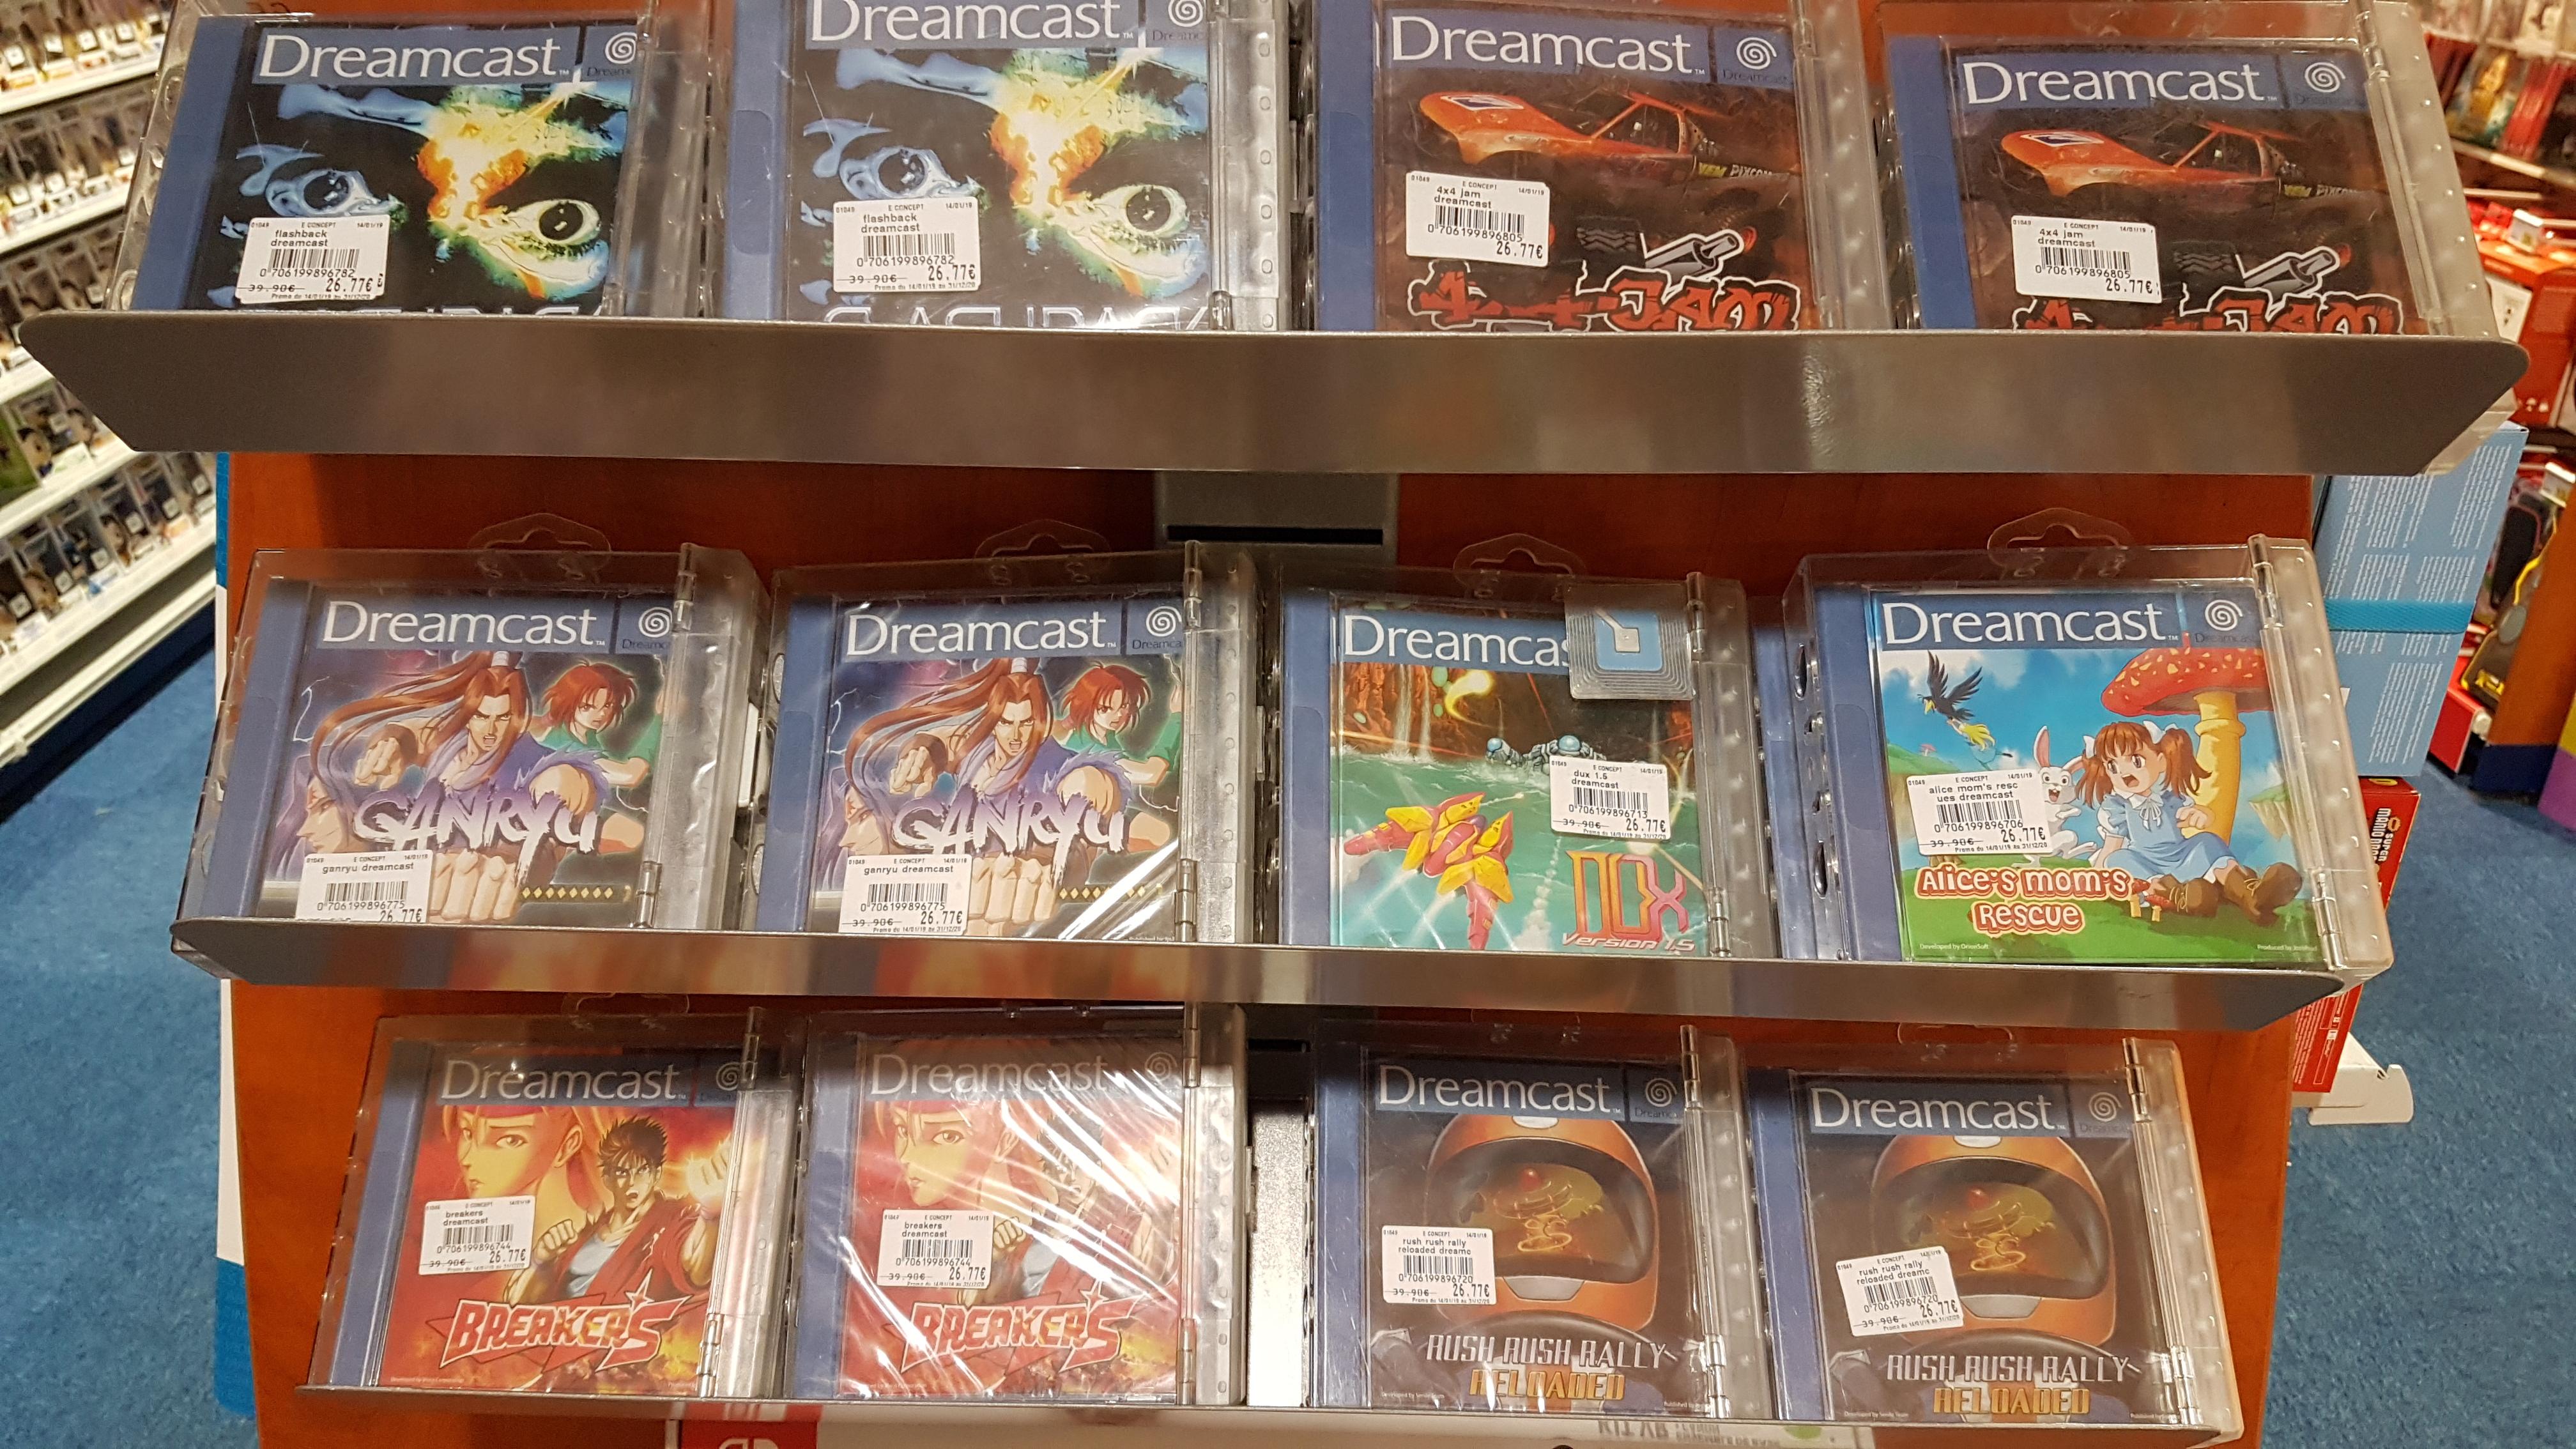 Jeux Dreamcast neuf à Leclerc o_O 1559653509-20190604-150218